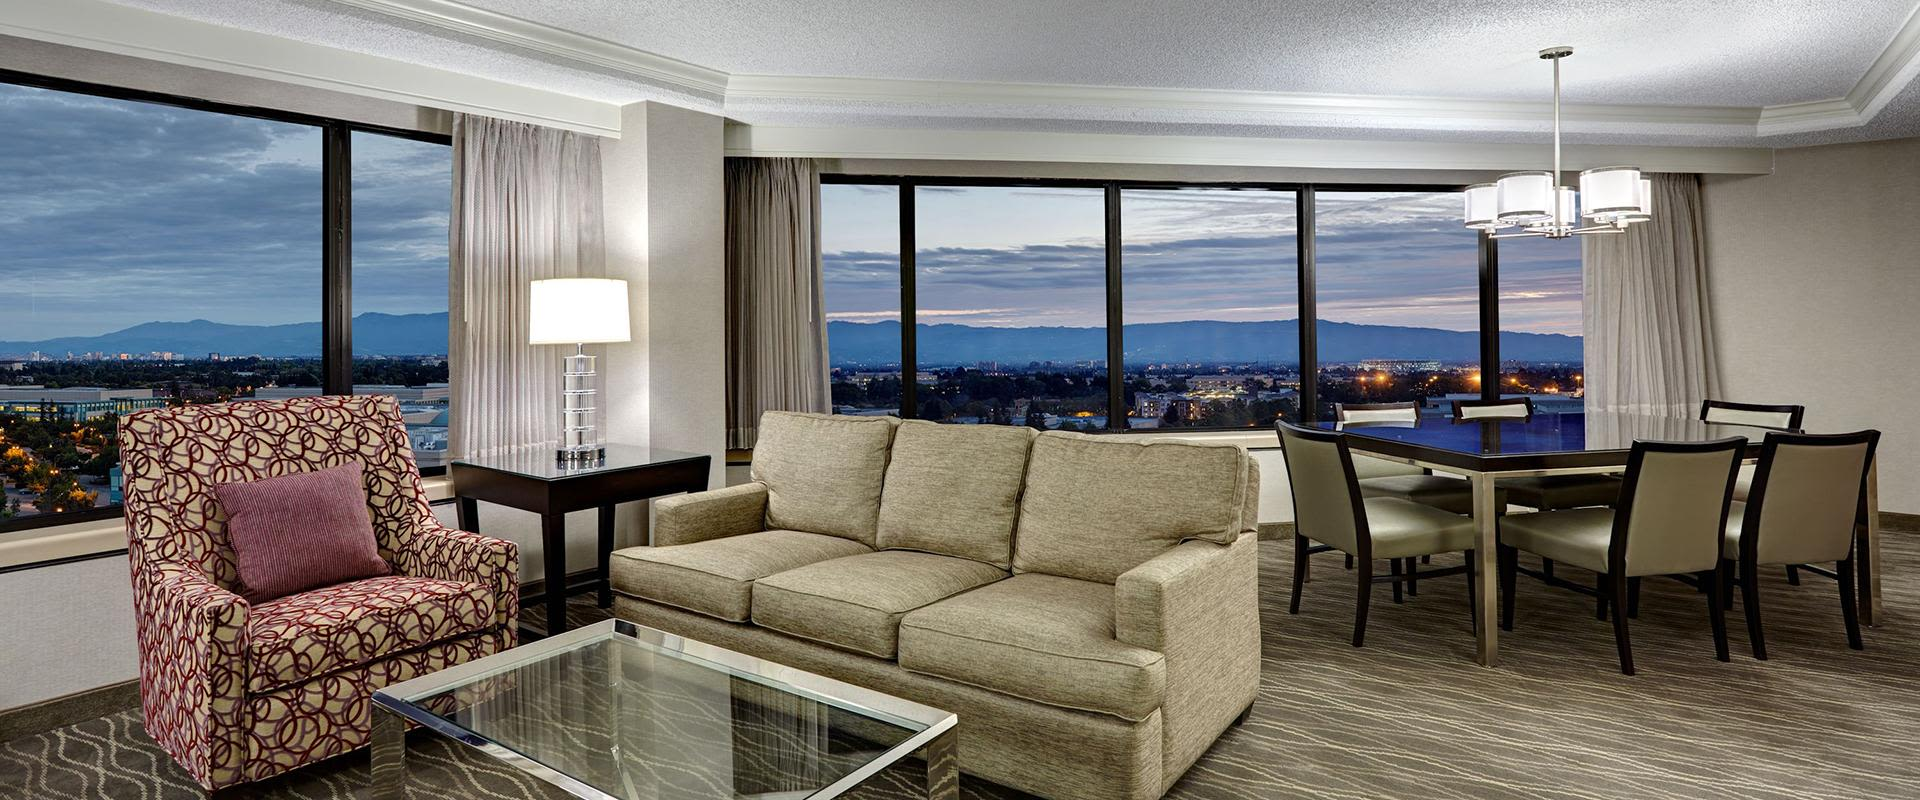 San Jose Spacious Hotel Suite Interior